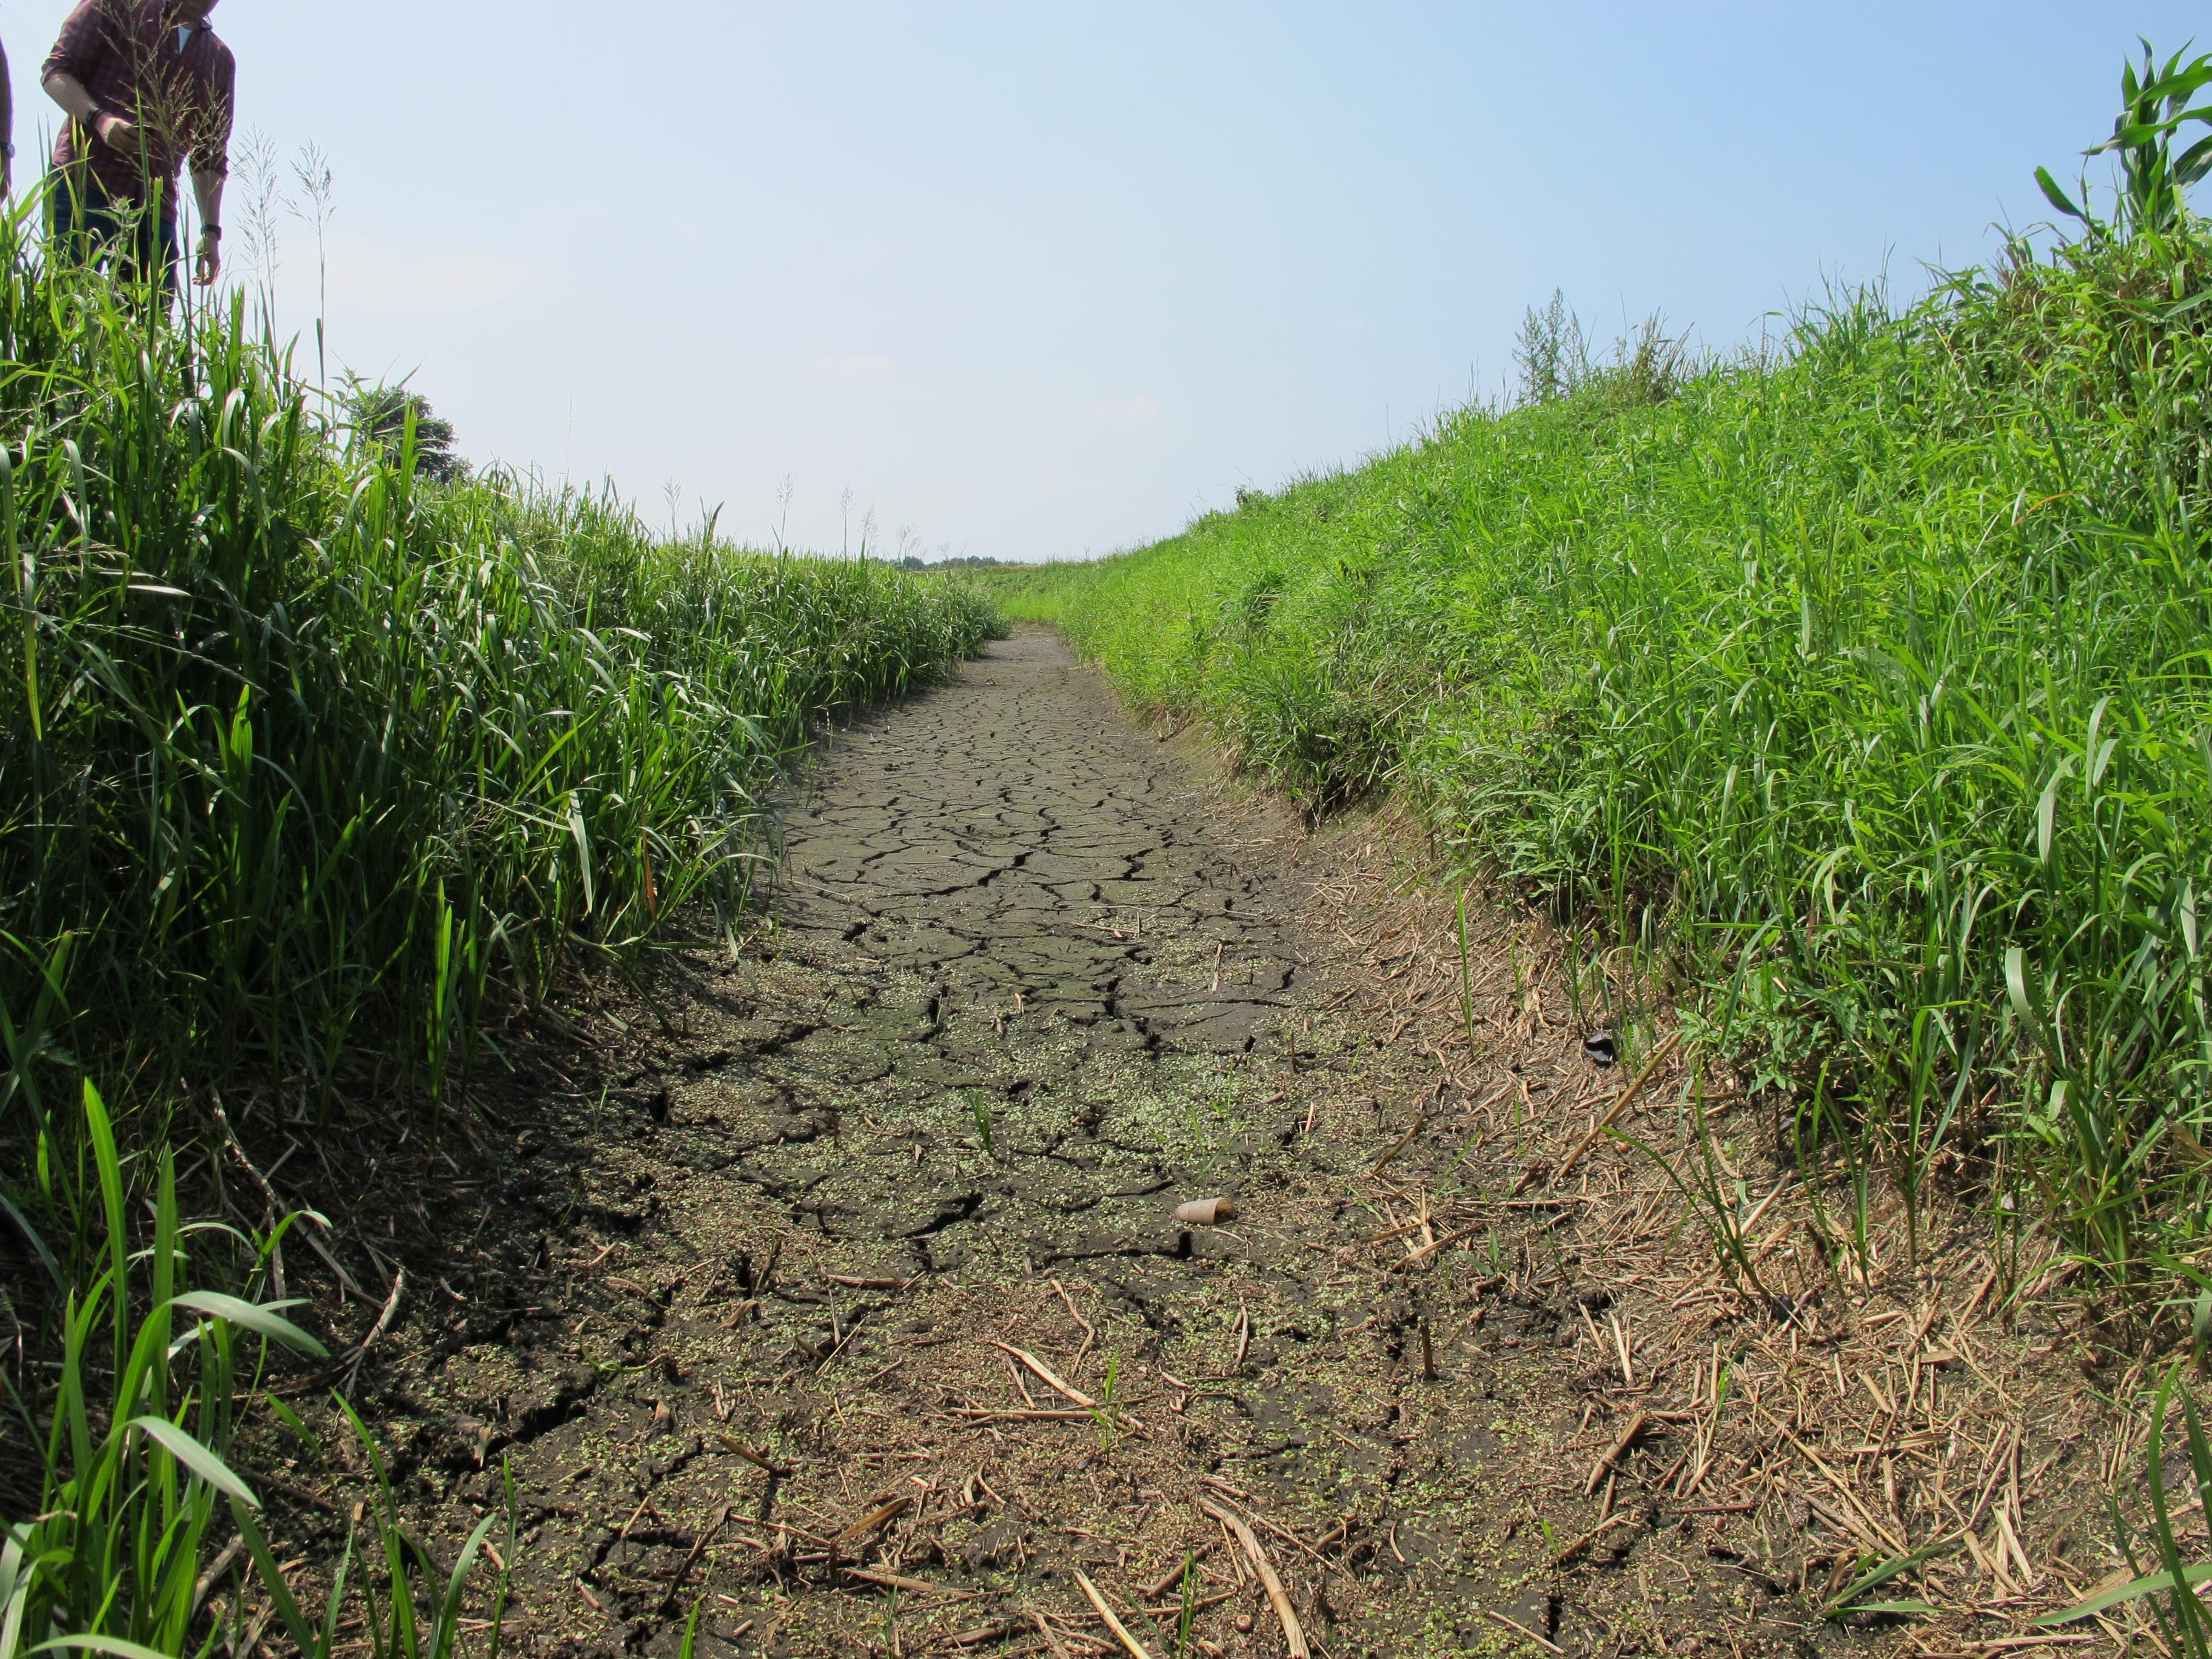 Waterschap aa maas stelt onttrekkingsverbod uit oppervlaktewater